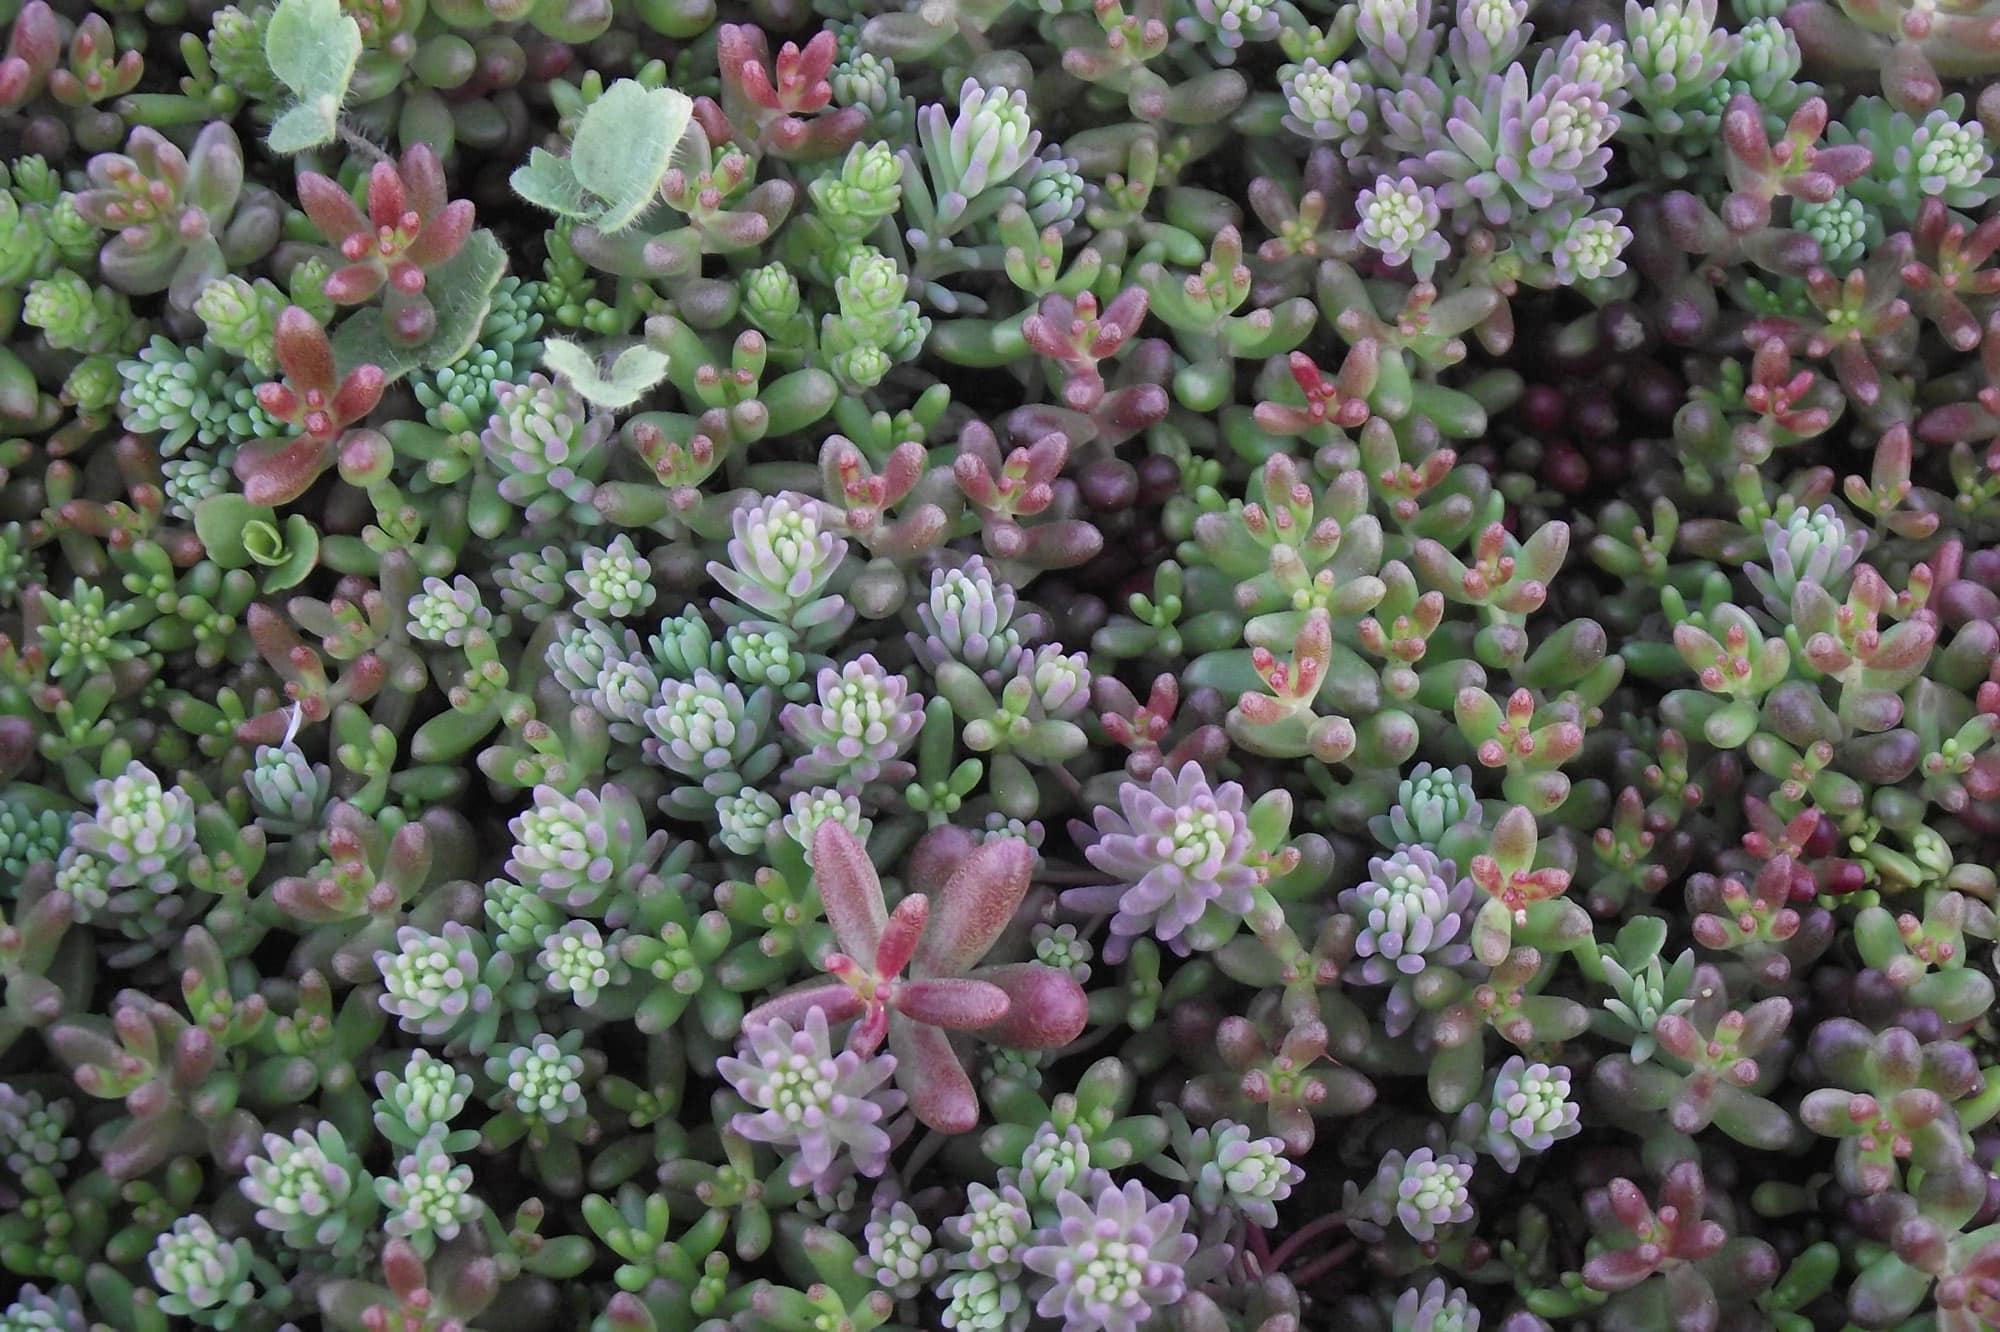 drought tolerant sedum plants make great alternative lawns that won't go brown in the summer